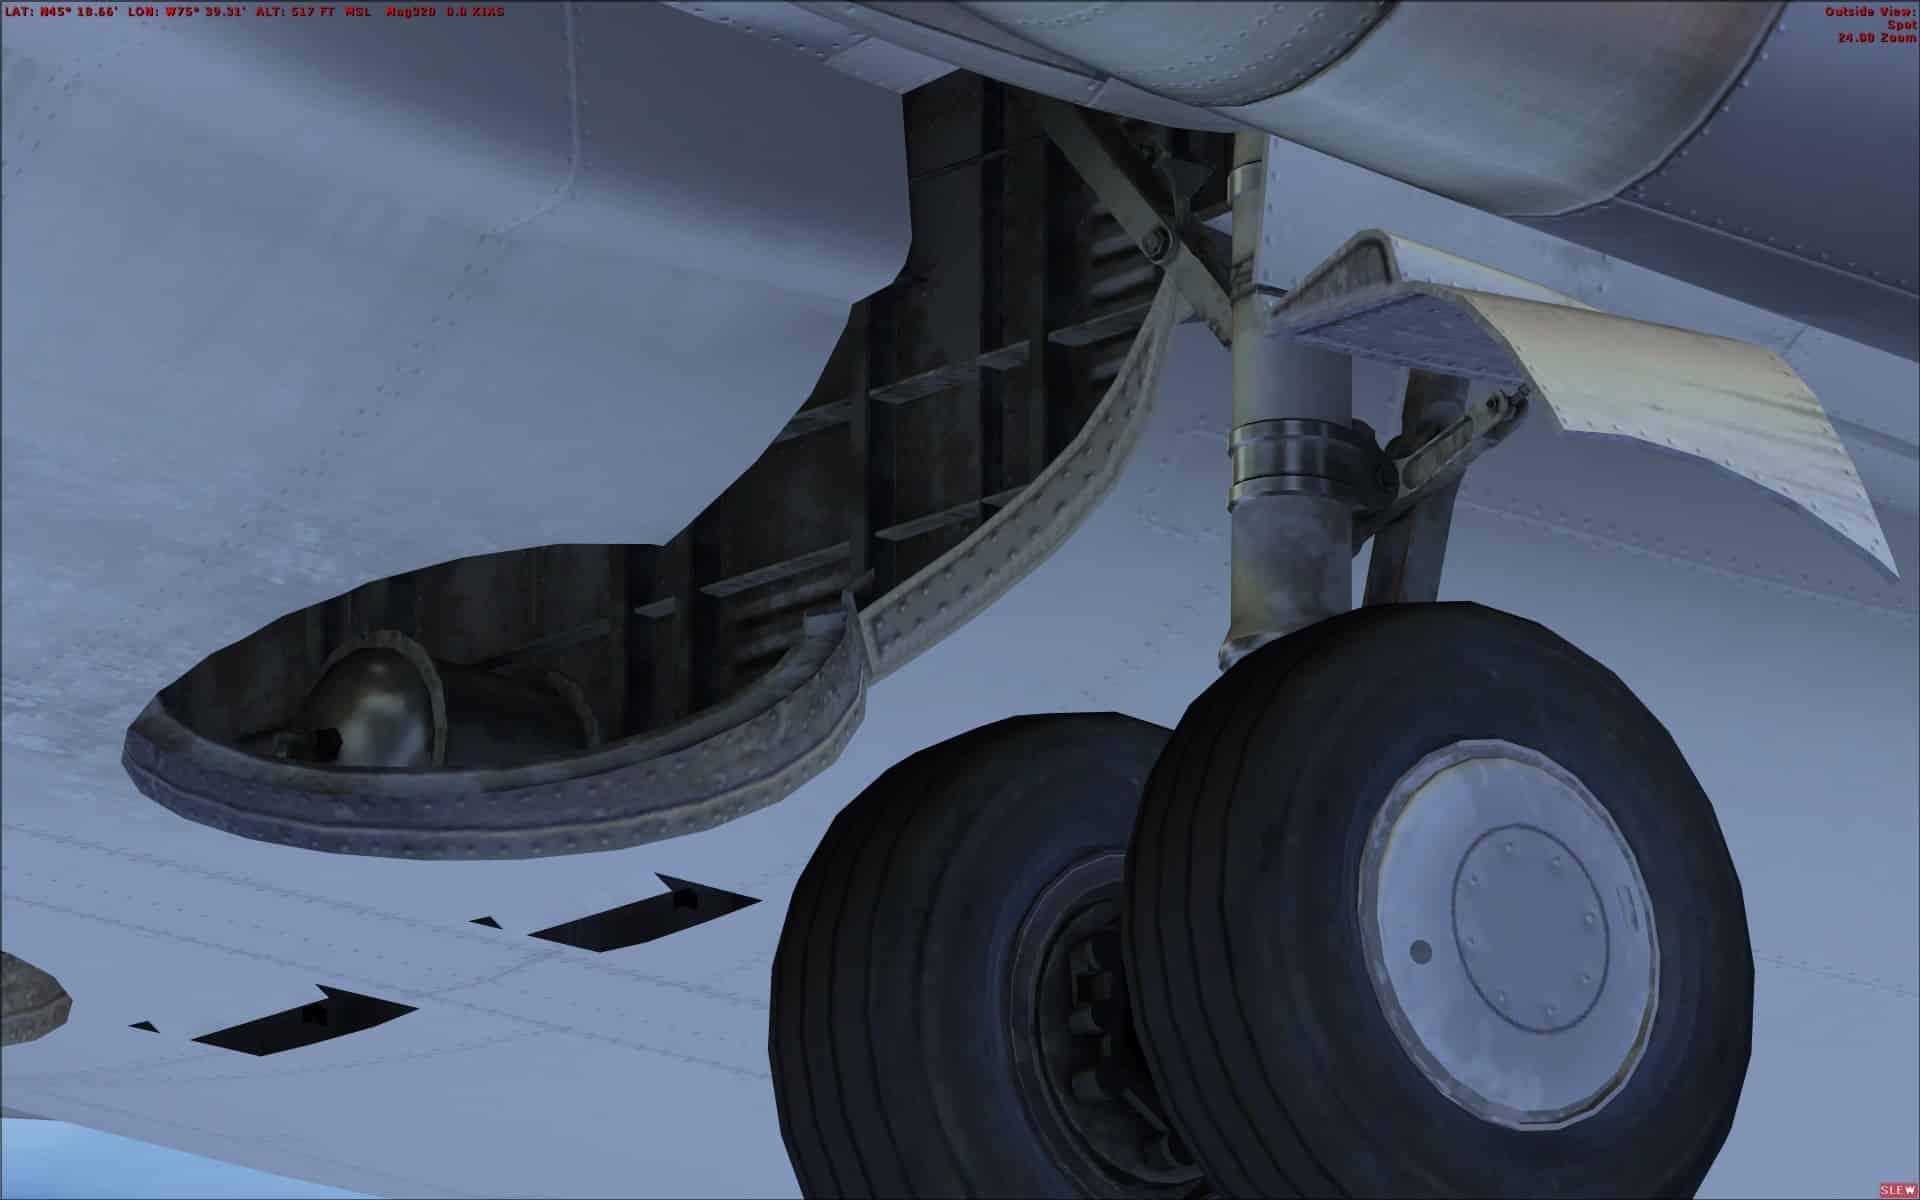 review of milviz boeing 737 200c for fsx p3dv1 the boeing 737 rh simflight com 737 Landing Gear Compartment Boeing 767 Landing Gear